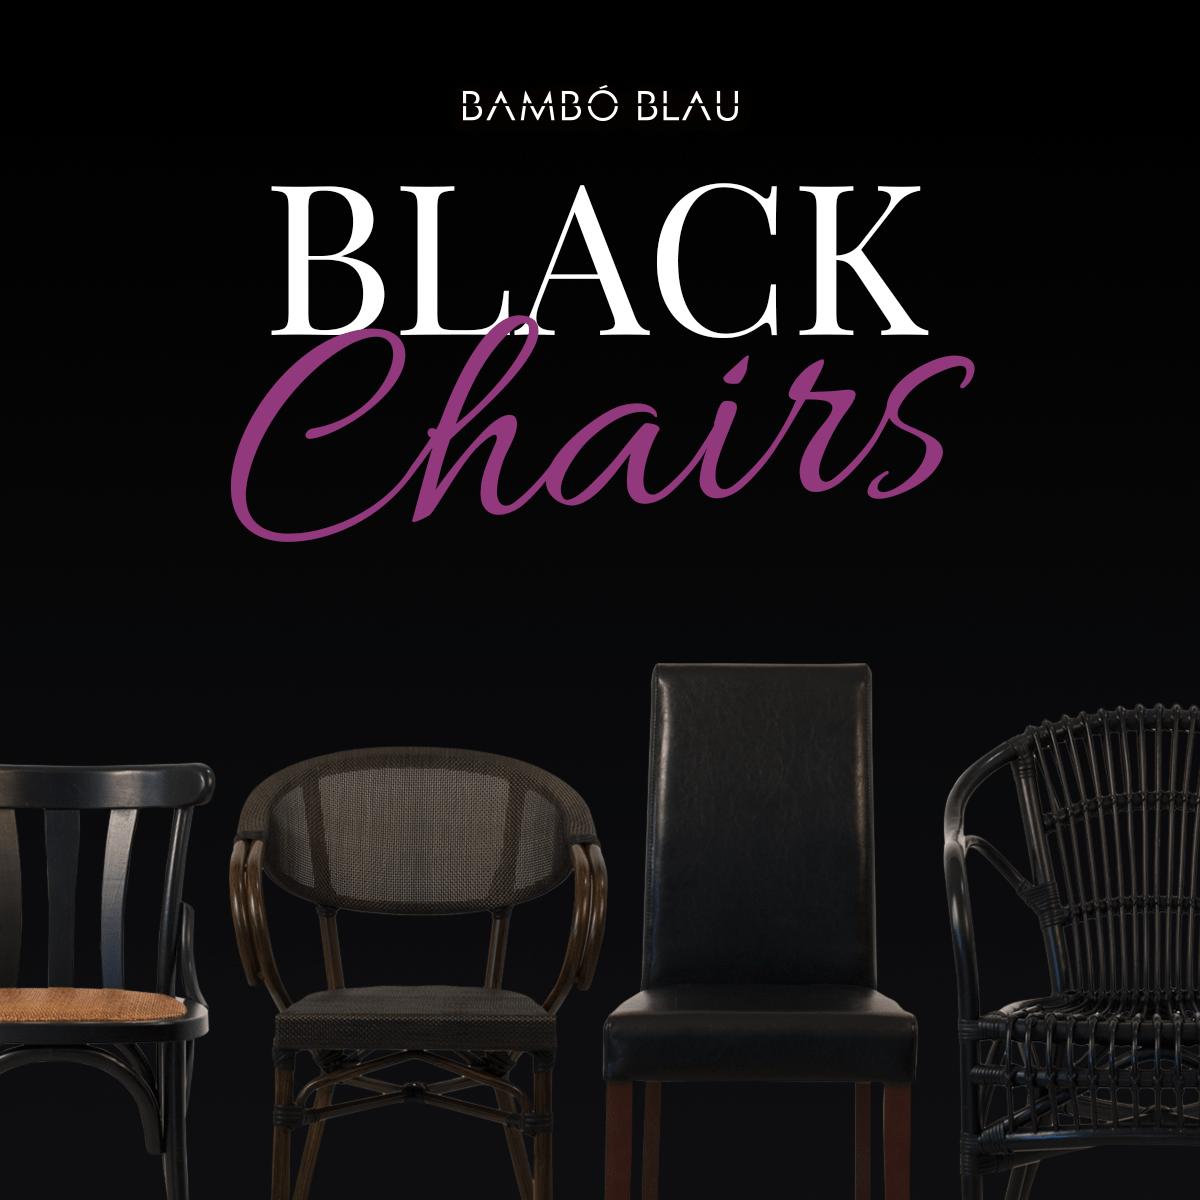 Black Chairs Bambó Blau